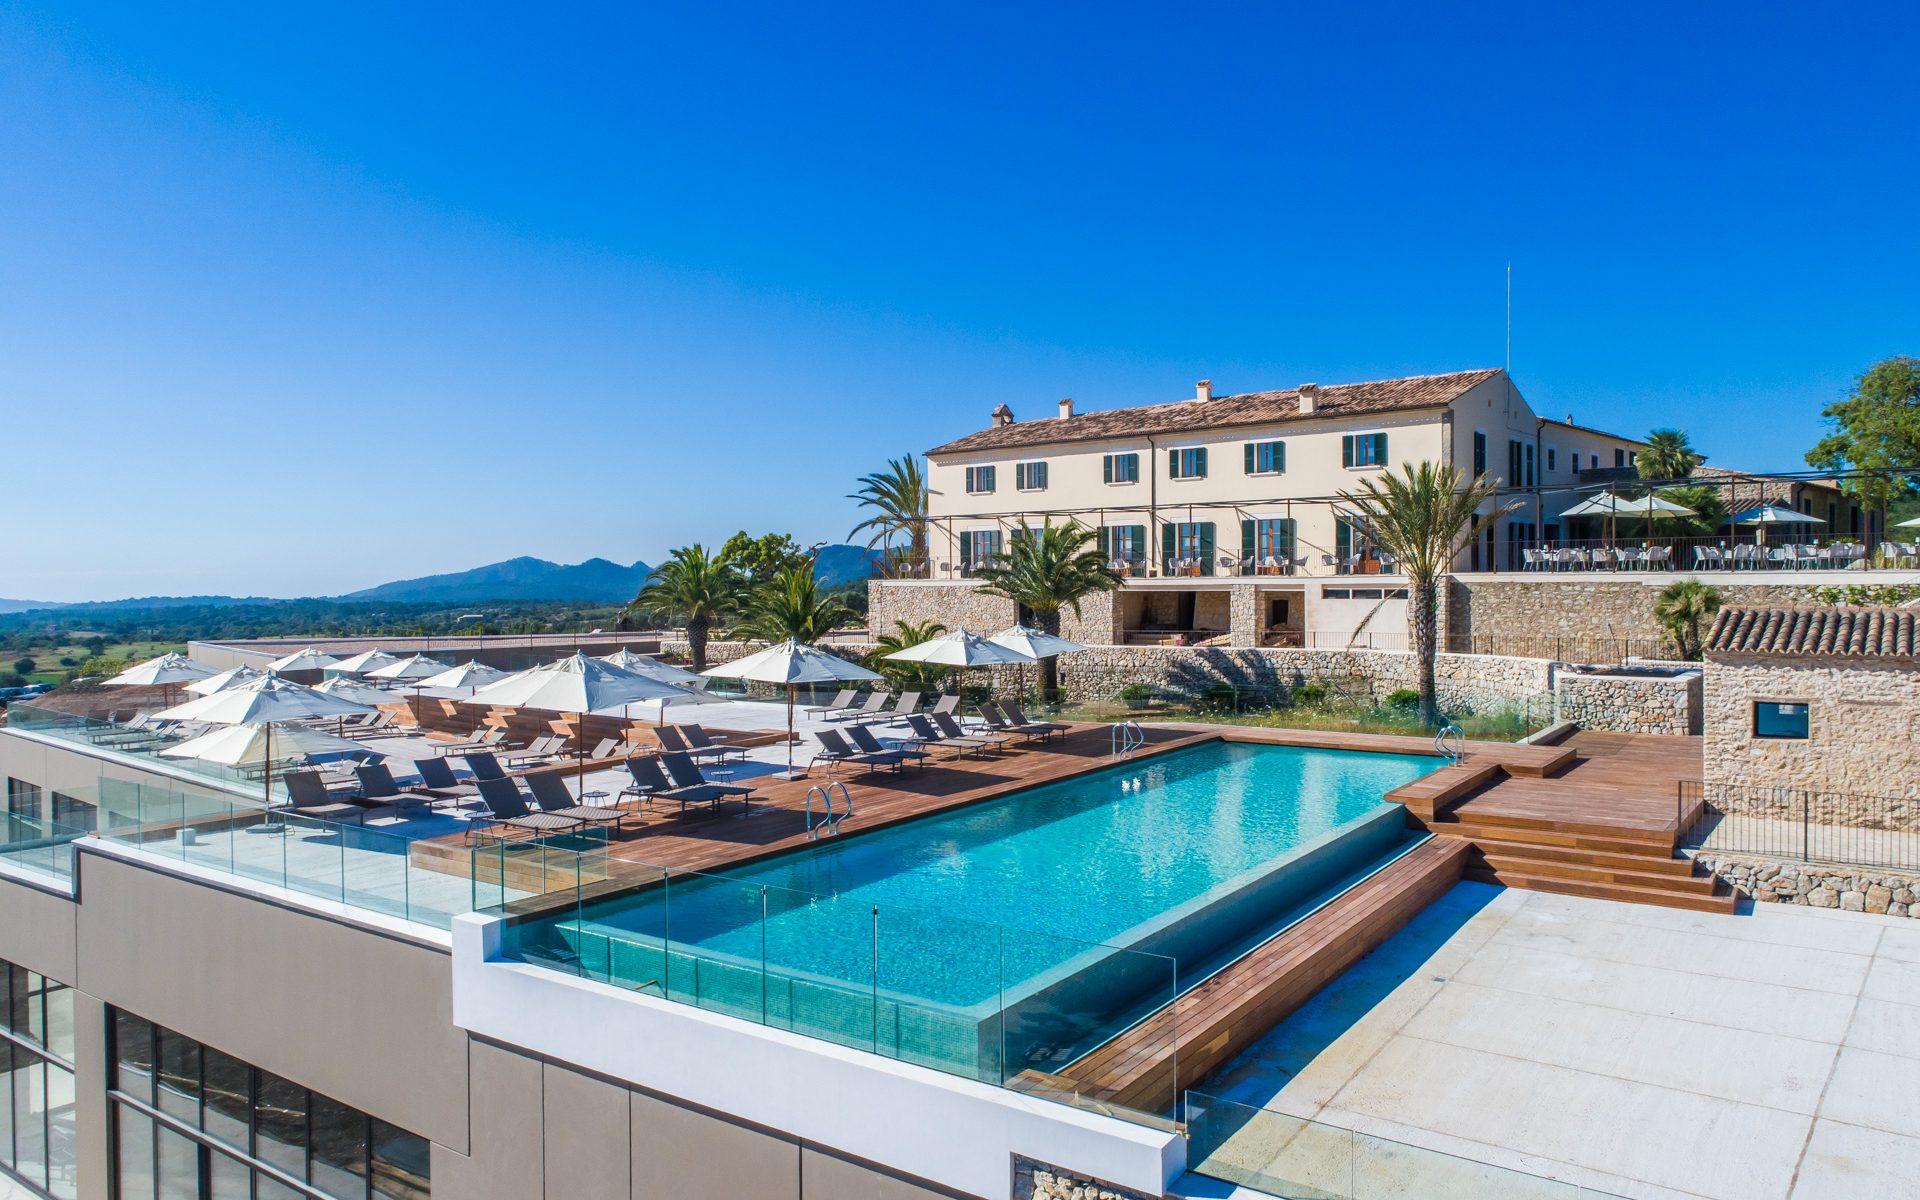 Carossa Resort Aerial Photo Hotel Photographer Fotograf Mallorca